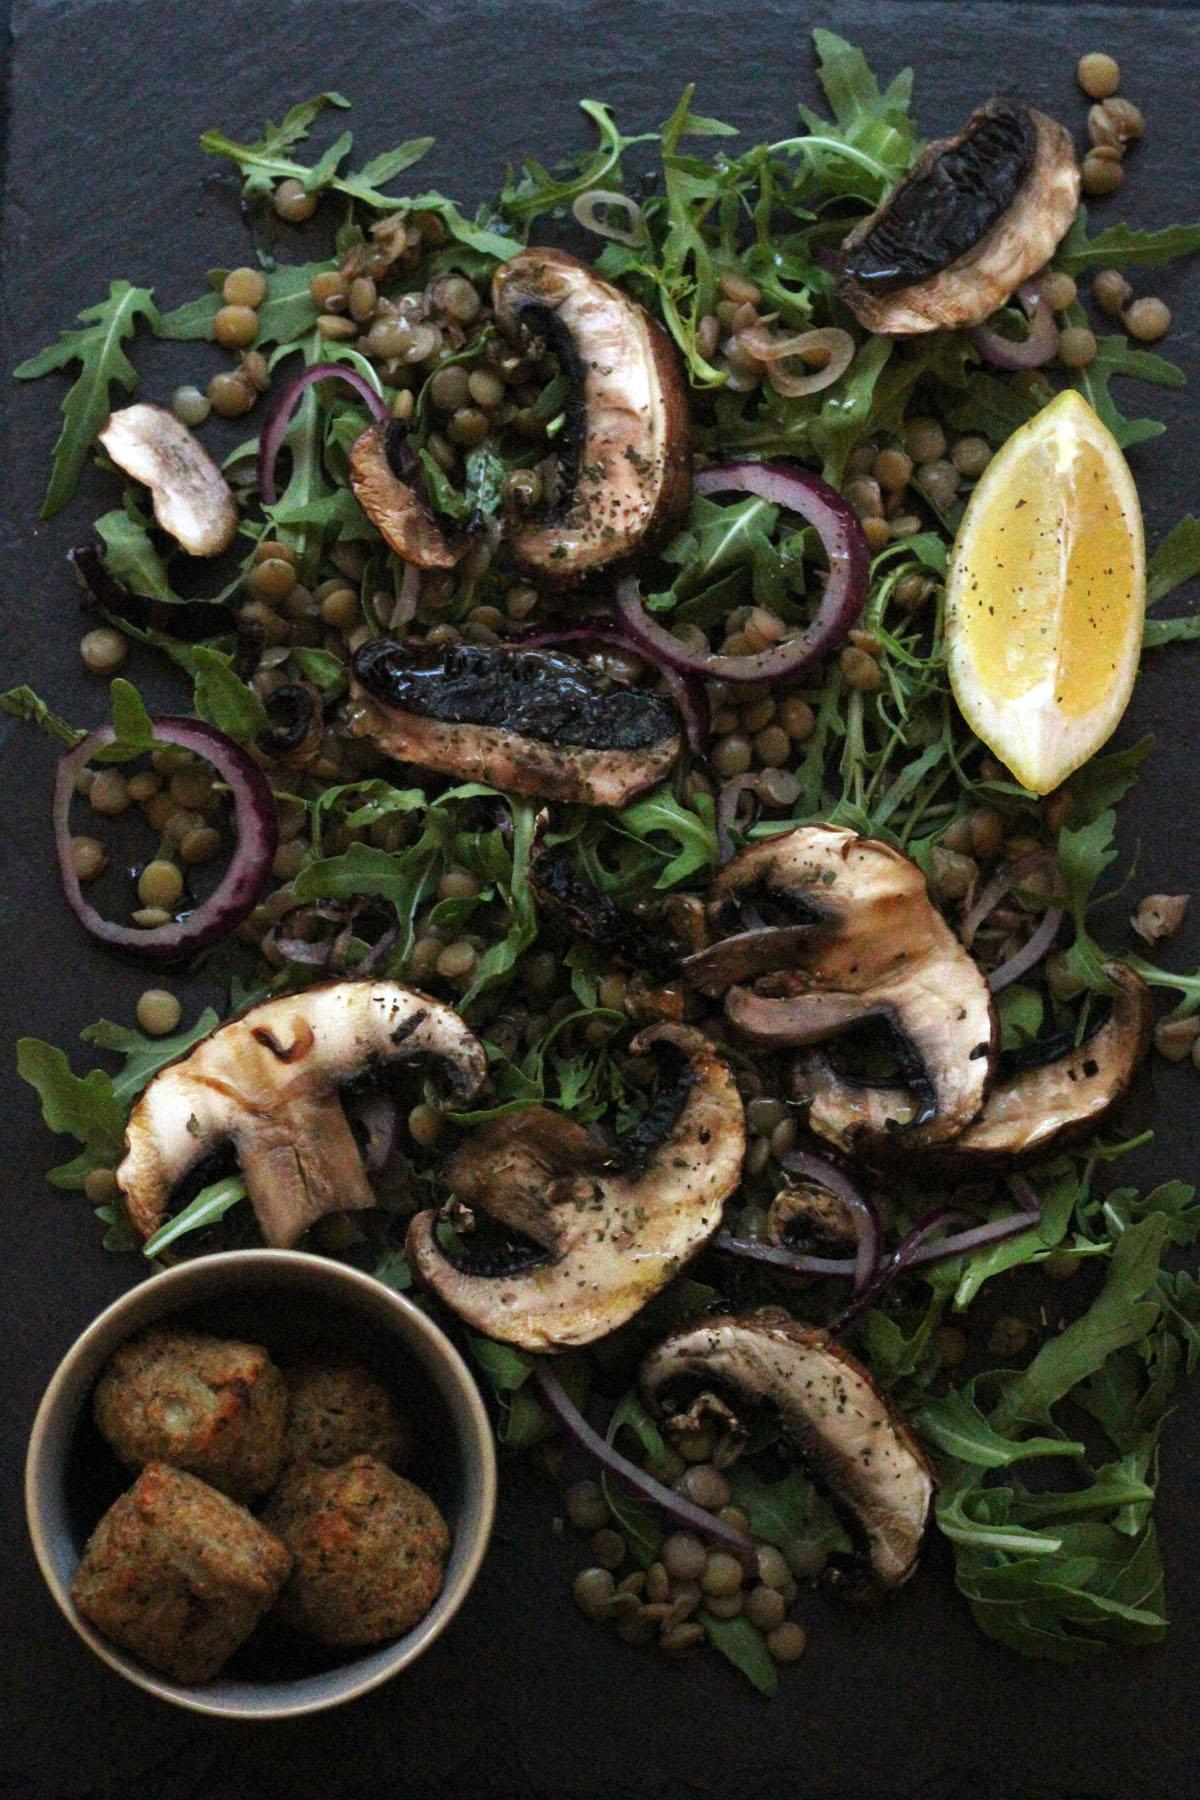 Portobello Mushroom and Lentil Salad with Lemon Dressing